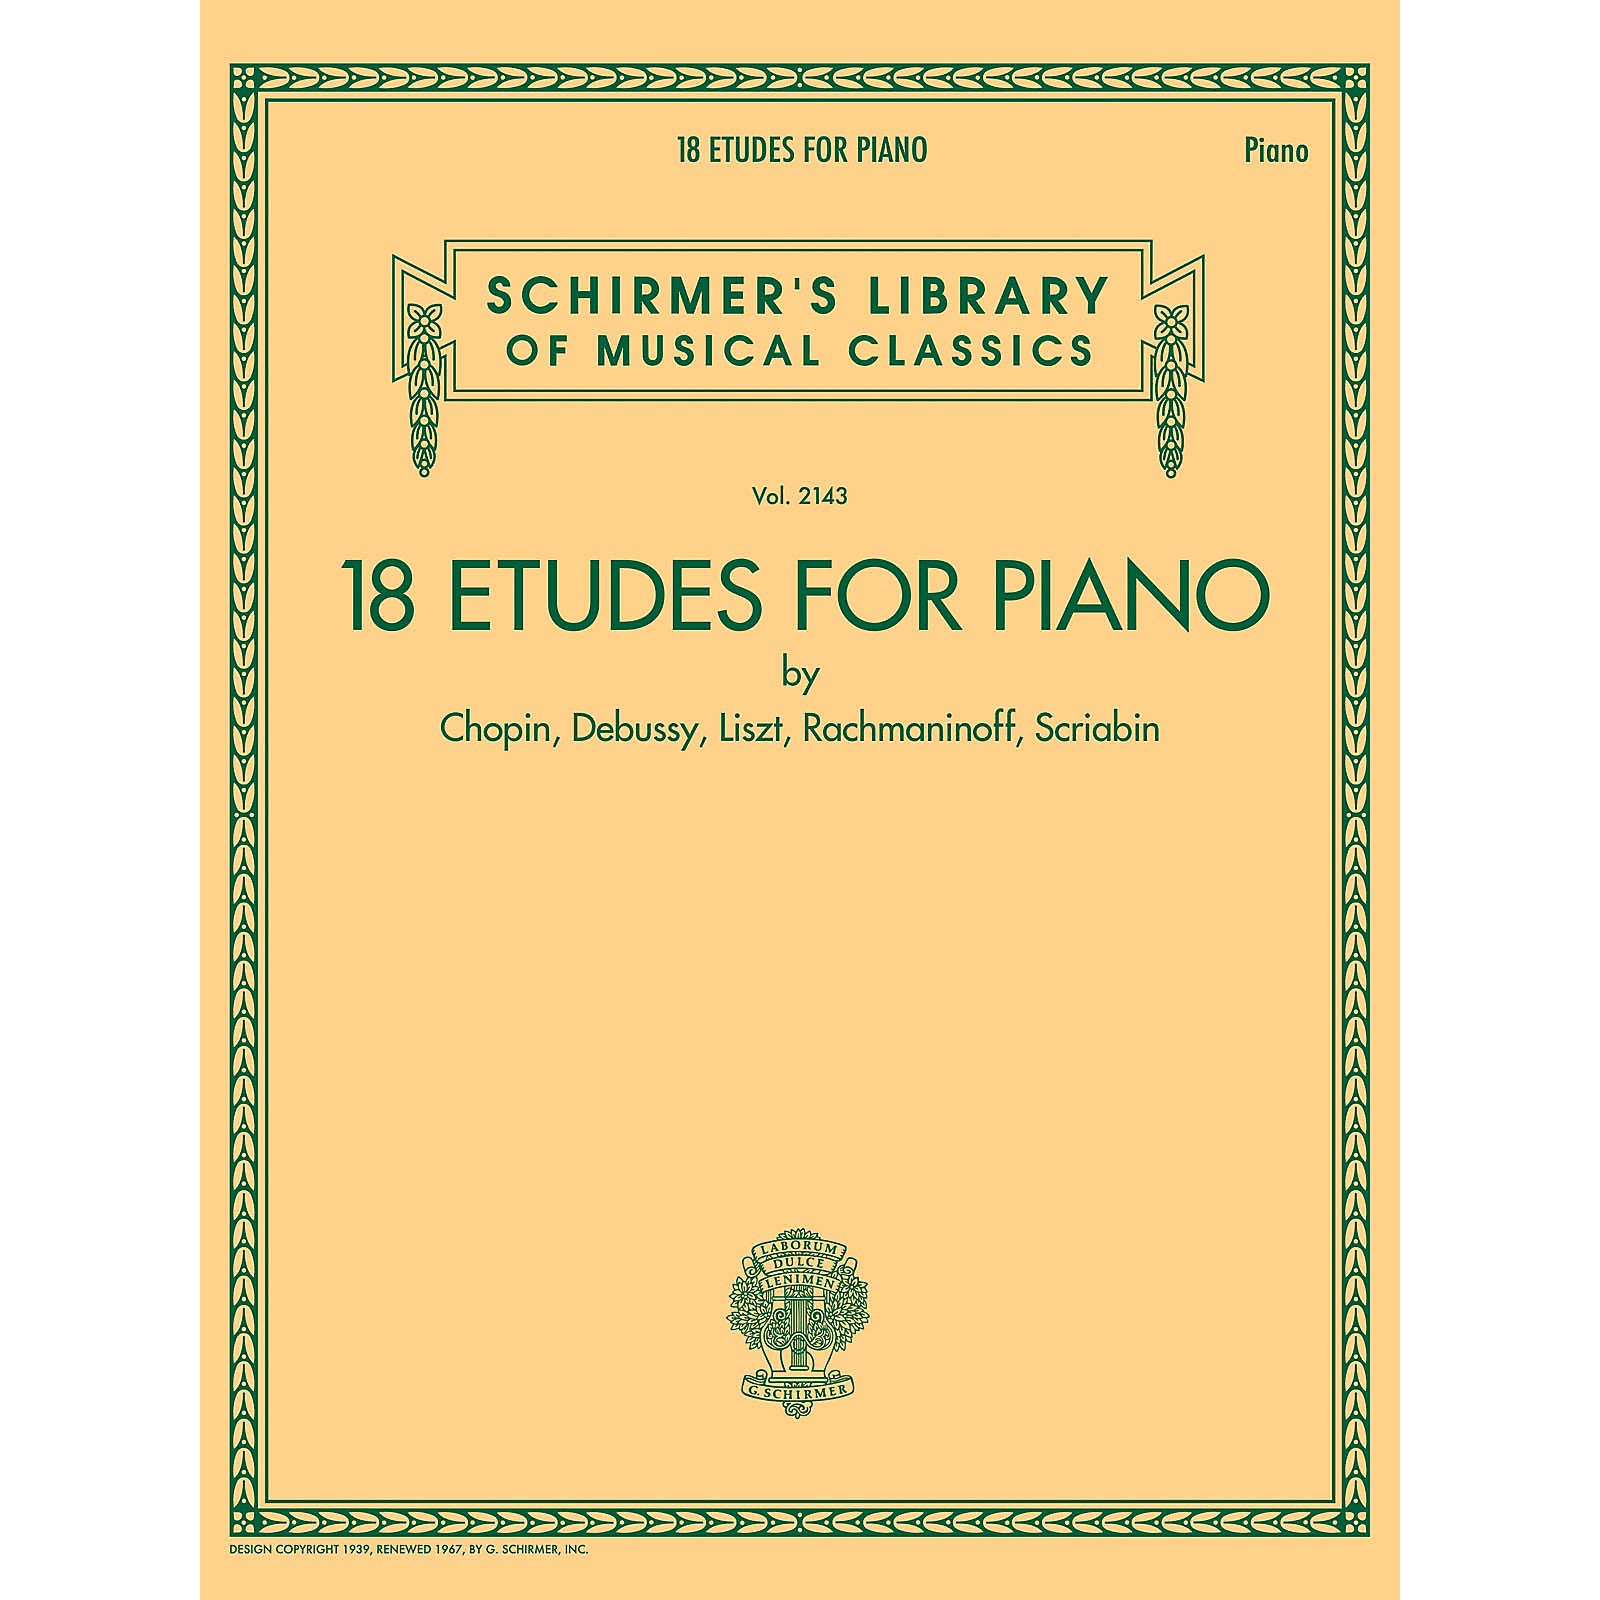 G. Schirmer 18 Etudes for Piano - Schirmer's Library of Musical Classics Volume 2143